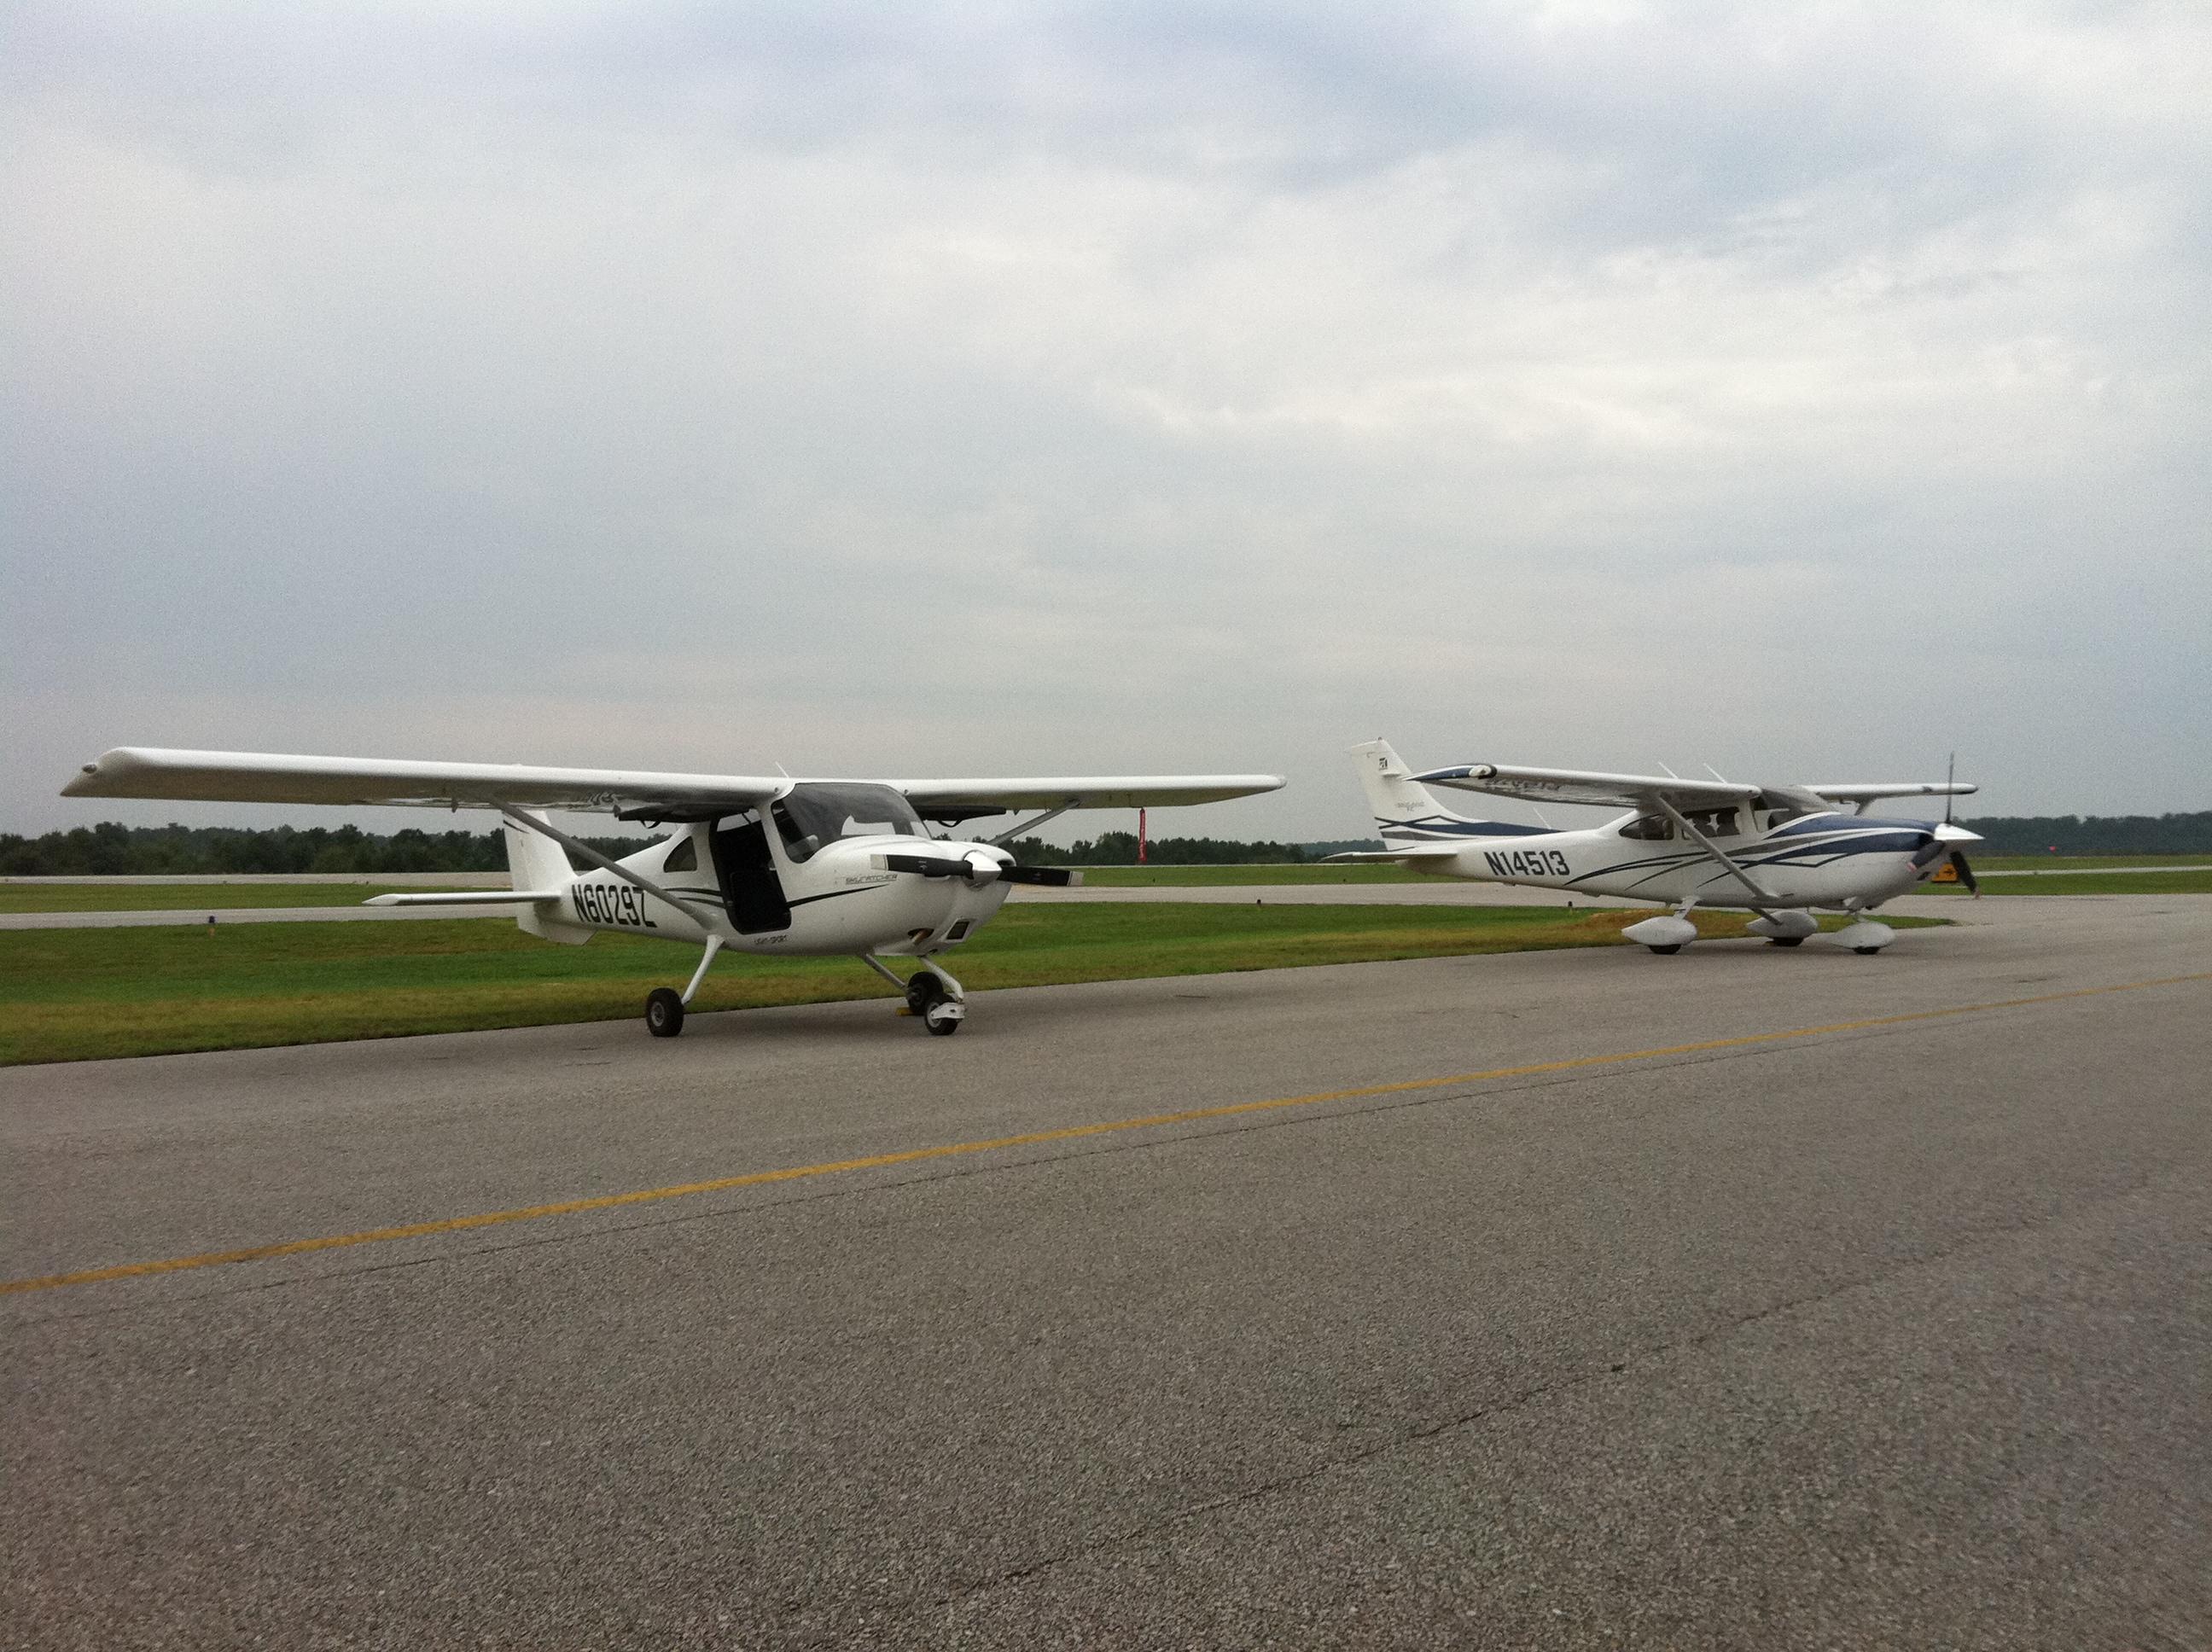 Cessna 162 Skycatcher compared to Cessna Turbo Skylane model 182T ...